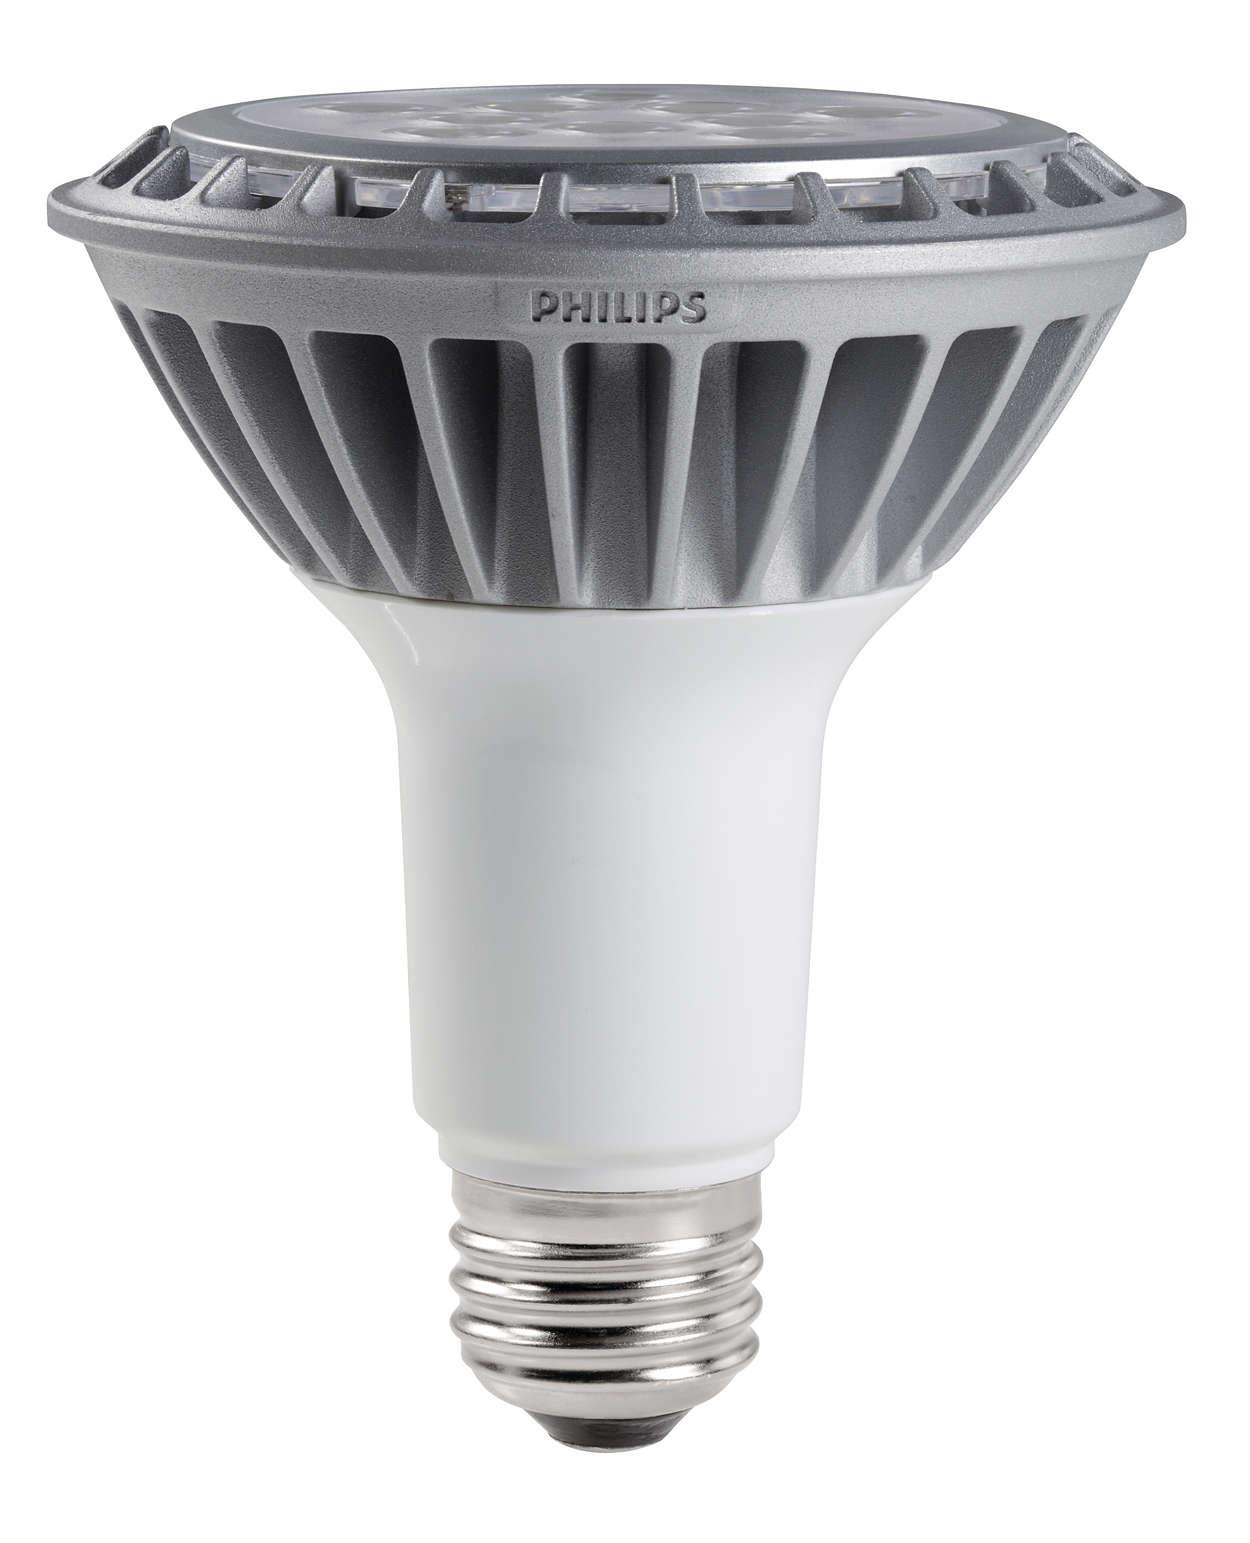 AmbientLED Energy saving indoor flood light 046677410285 | Philips